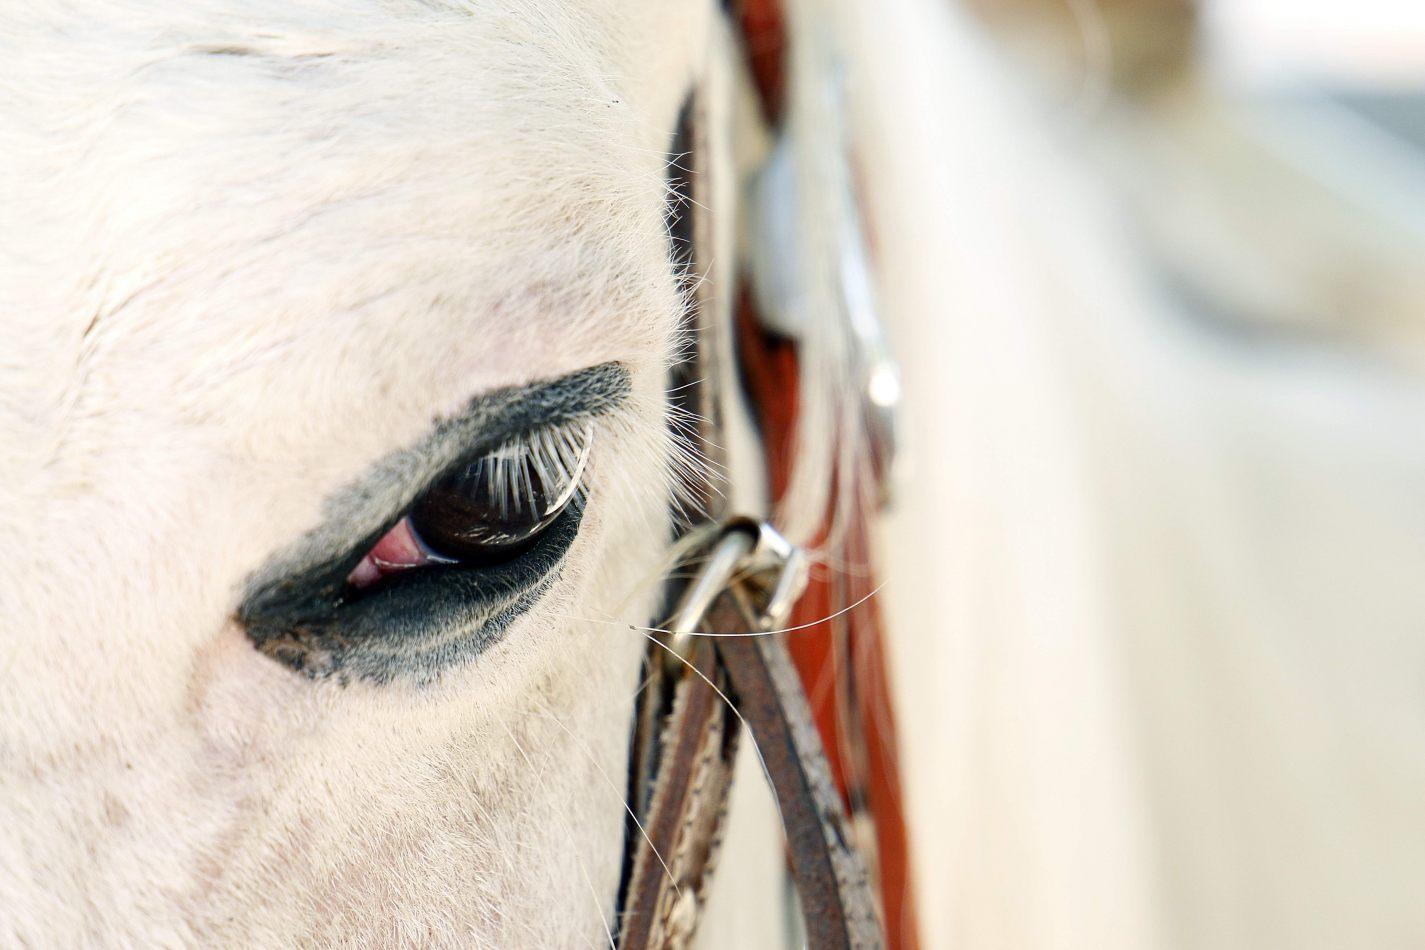 Anthony Ellis Photography: Small Sacrifices - Granito